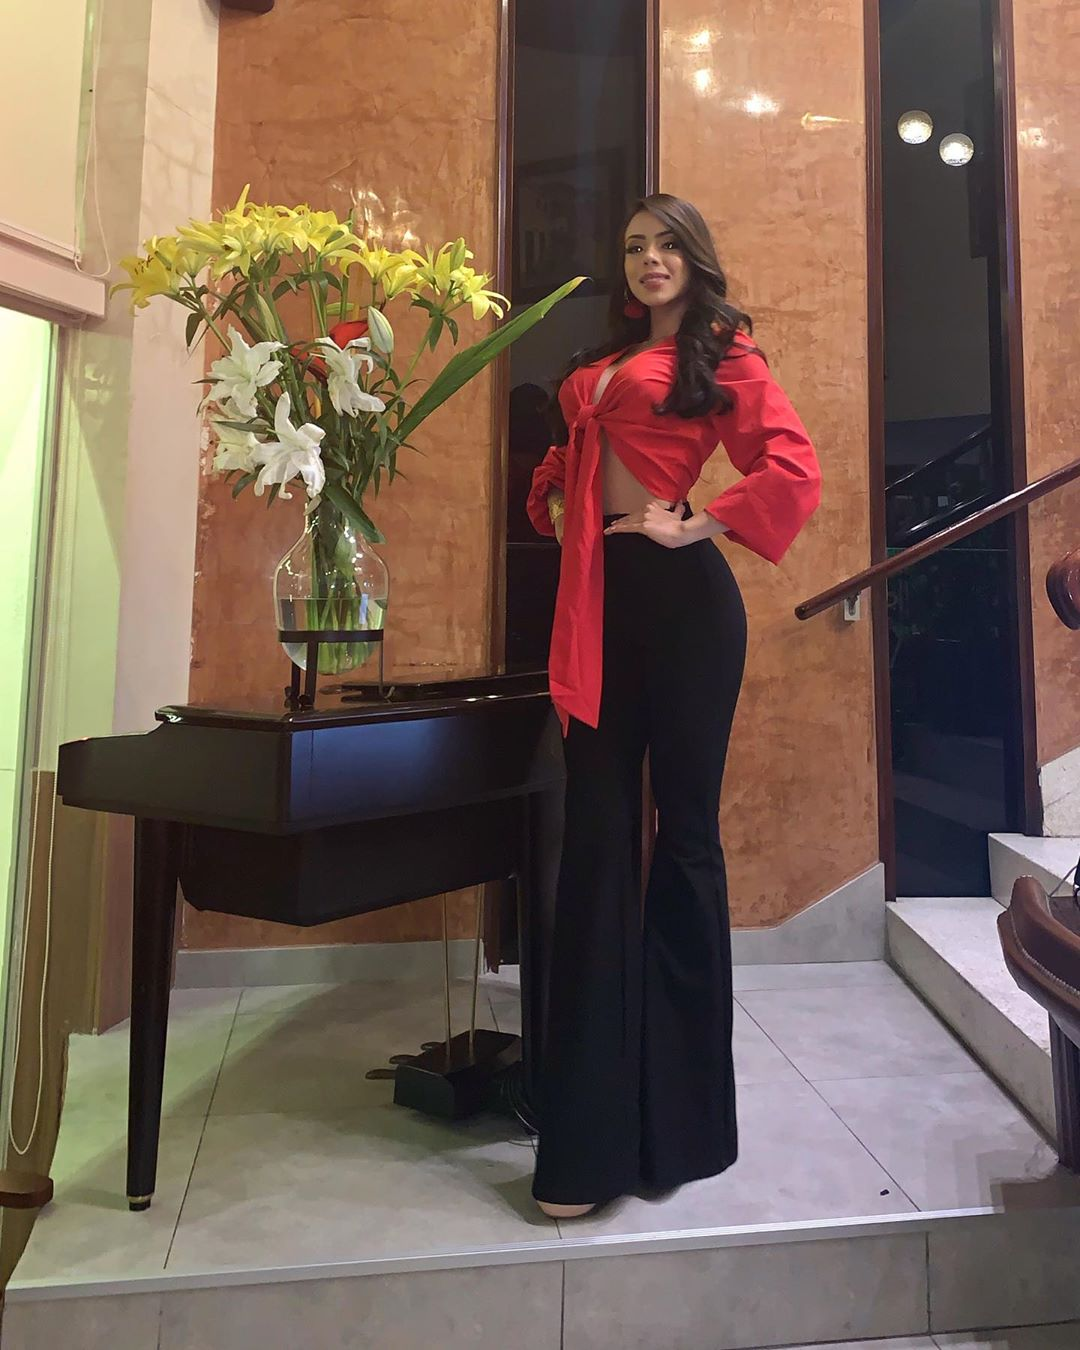 gina aguirre, virreyna de miss latinoamerica 2019. - Página 4 69239810